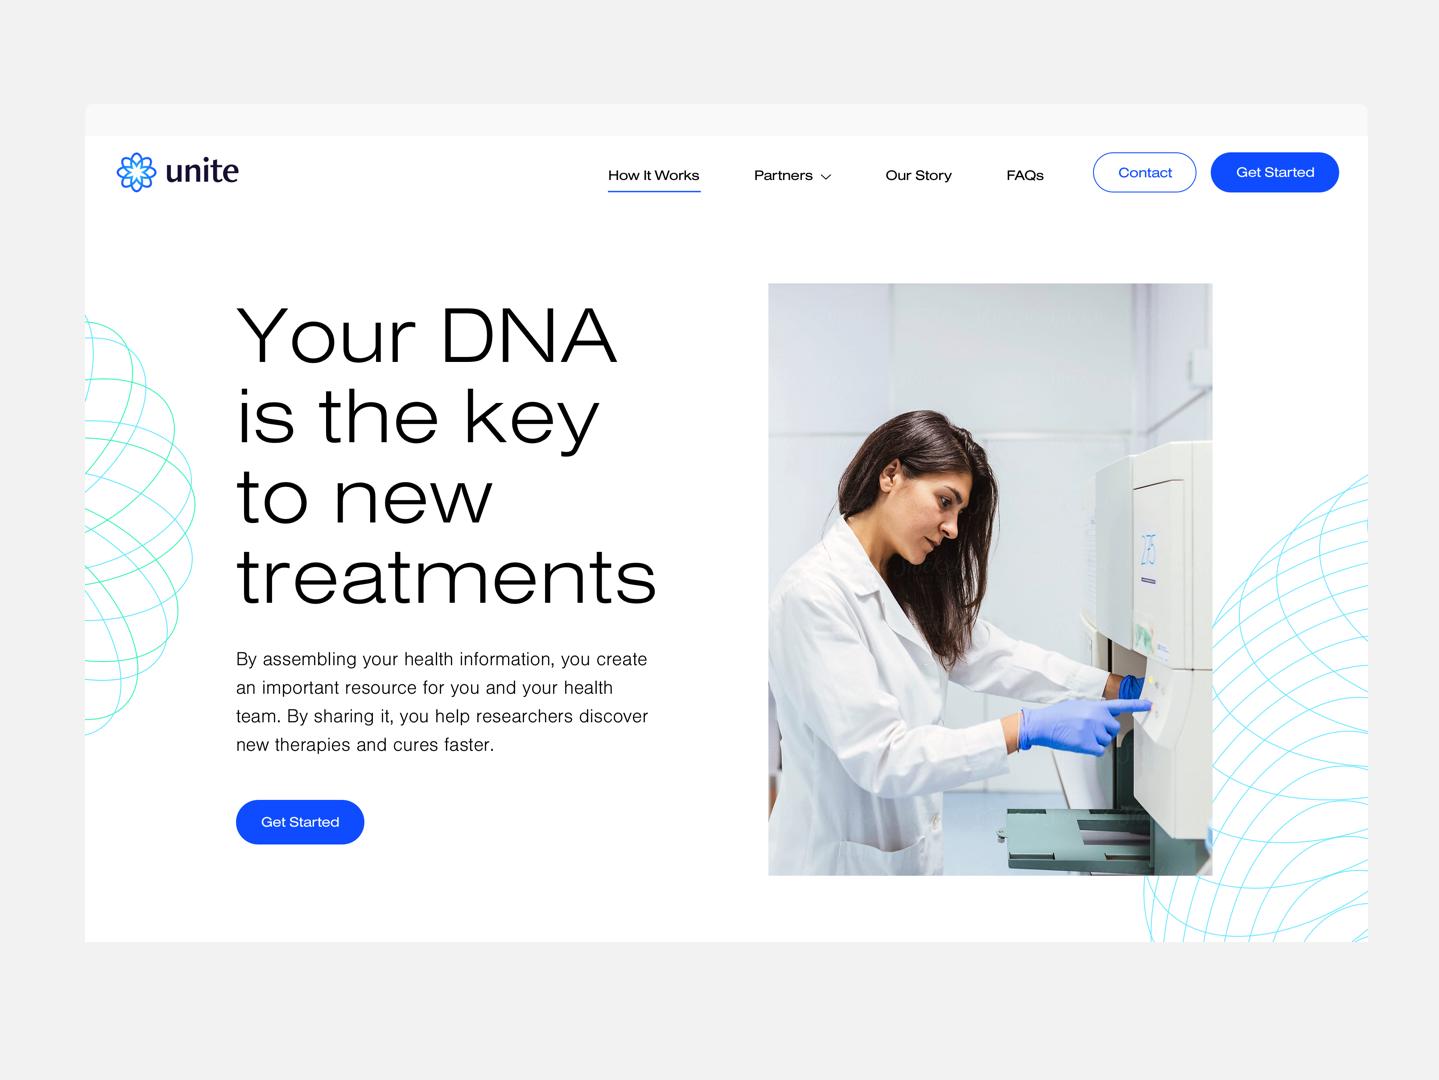 unite-genomics-branding-6.png